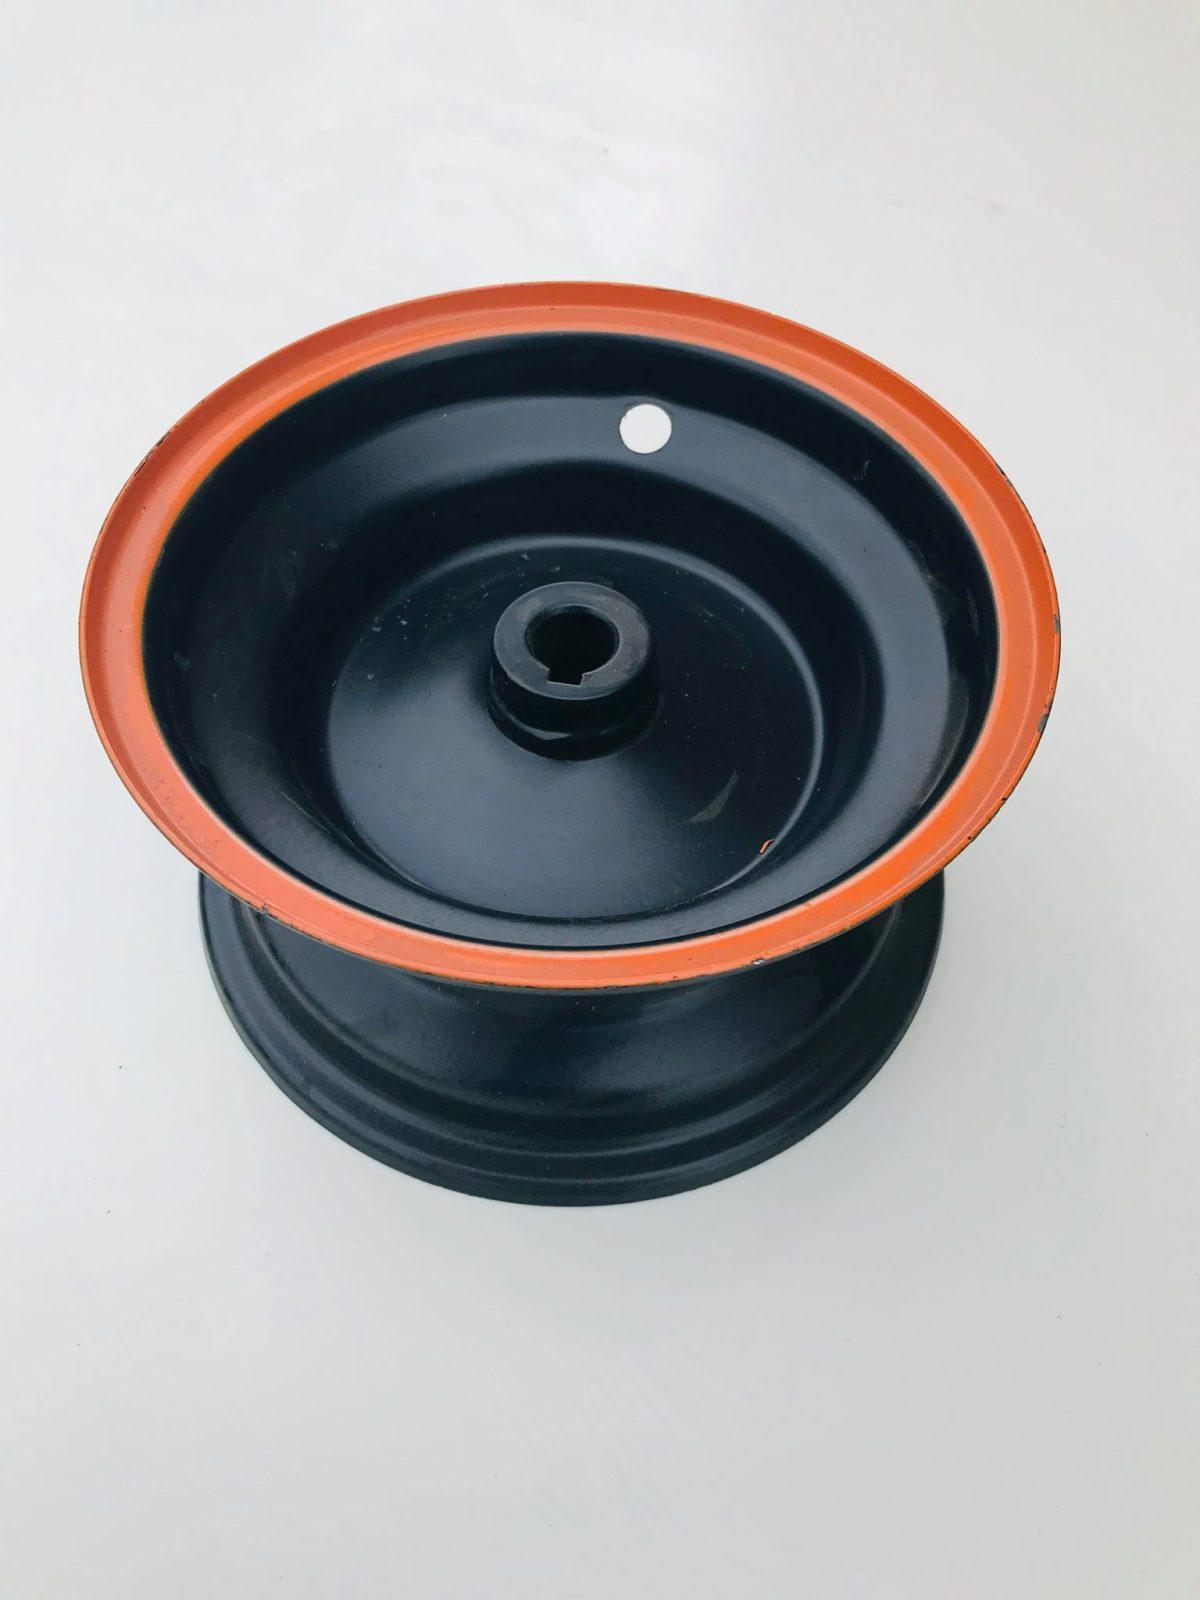 6″ Mini Quad Bike Rear Wheel Rim With Tubeless Tyre 4.10-6 – Orange